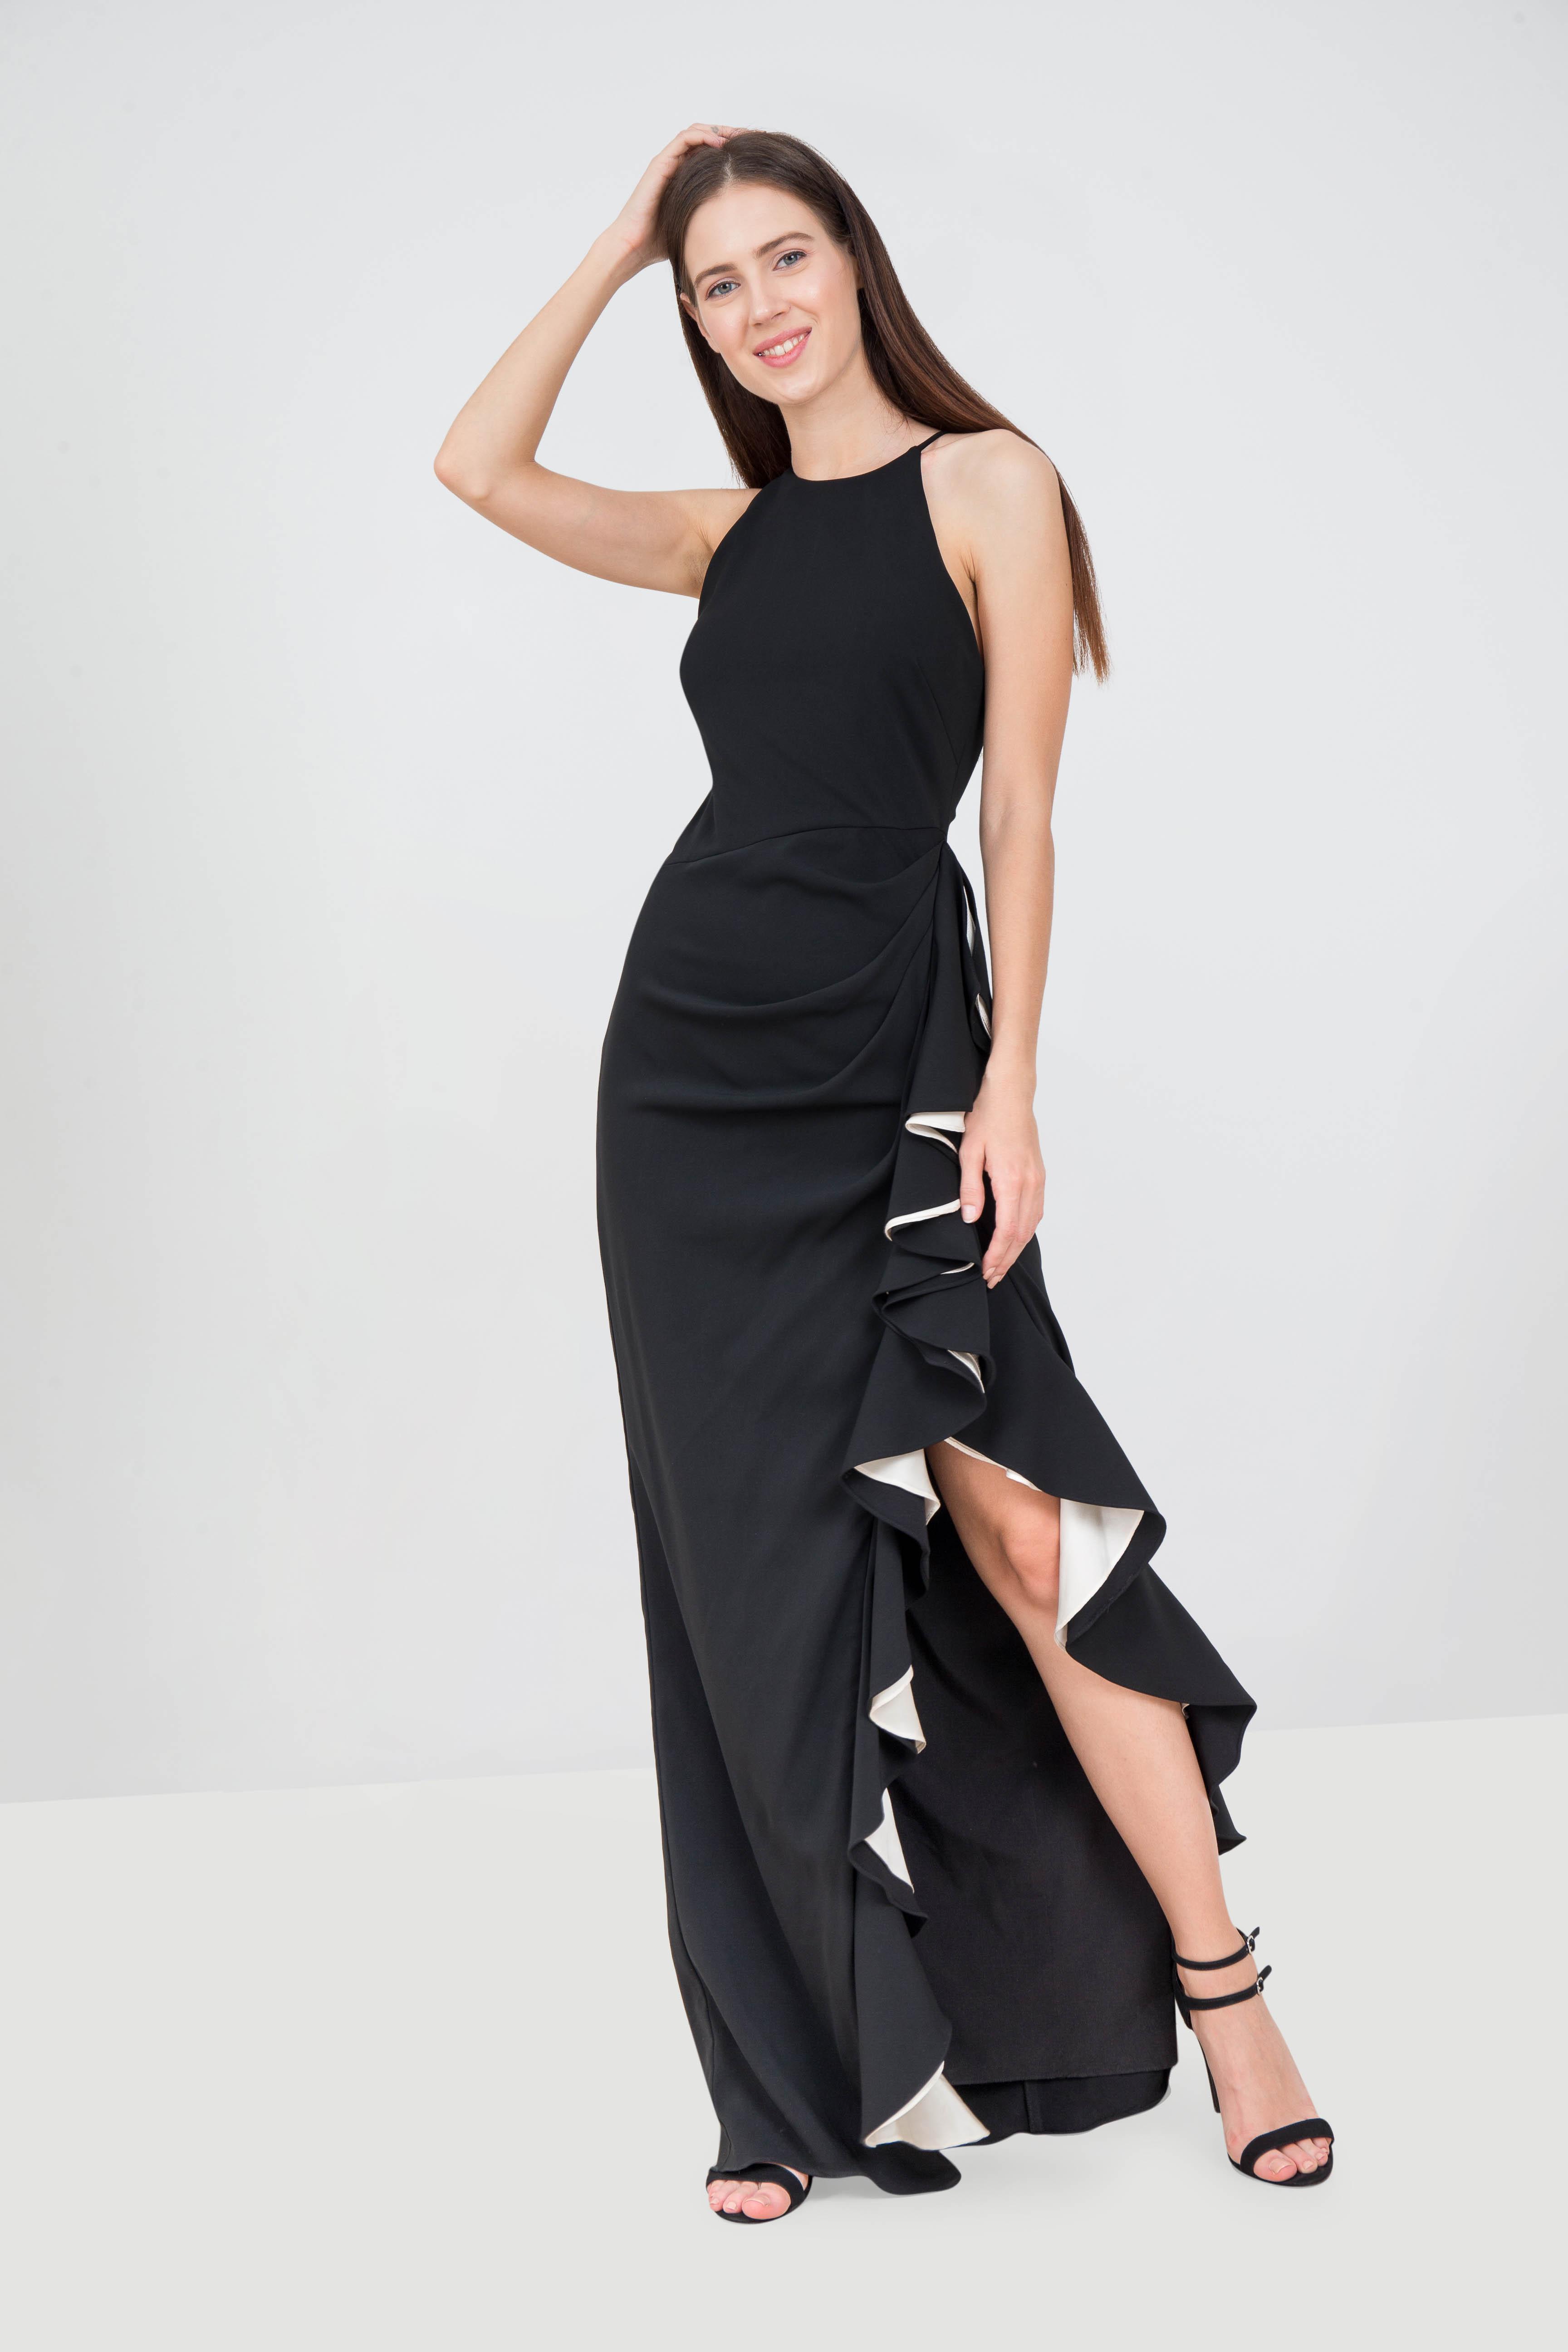 b77eecaa8ebe Rent BADGLEY MISCHKA Ruffle Trim Halter Gown in Dubai - Designer 24